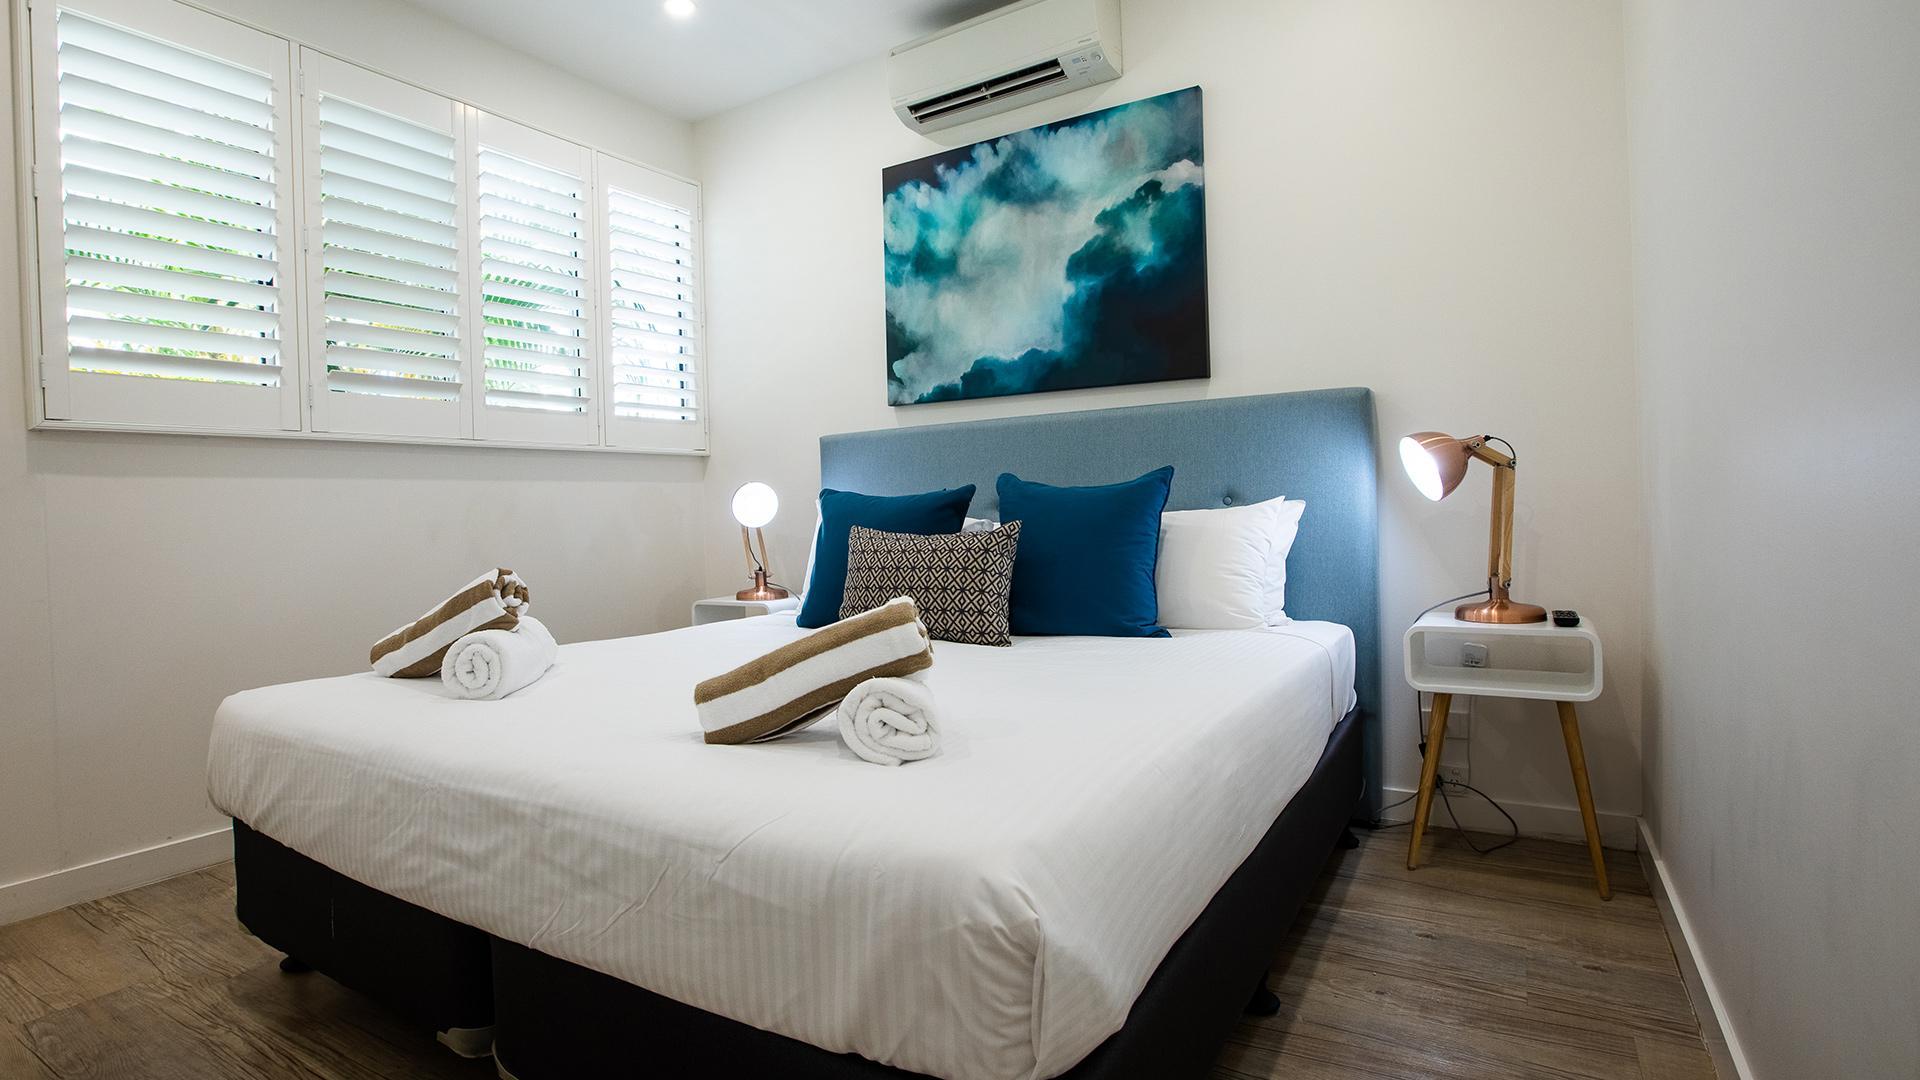 Three Bedroom Plunge Pool Apartment image 1 at Pool Resort Port Douglas - OCT 2018 by Douglas Shire, Queensland, Australia